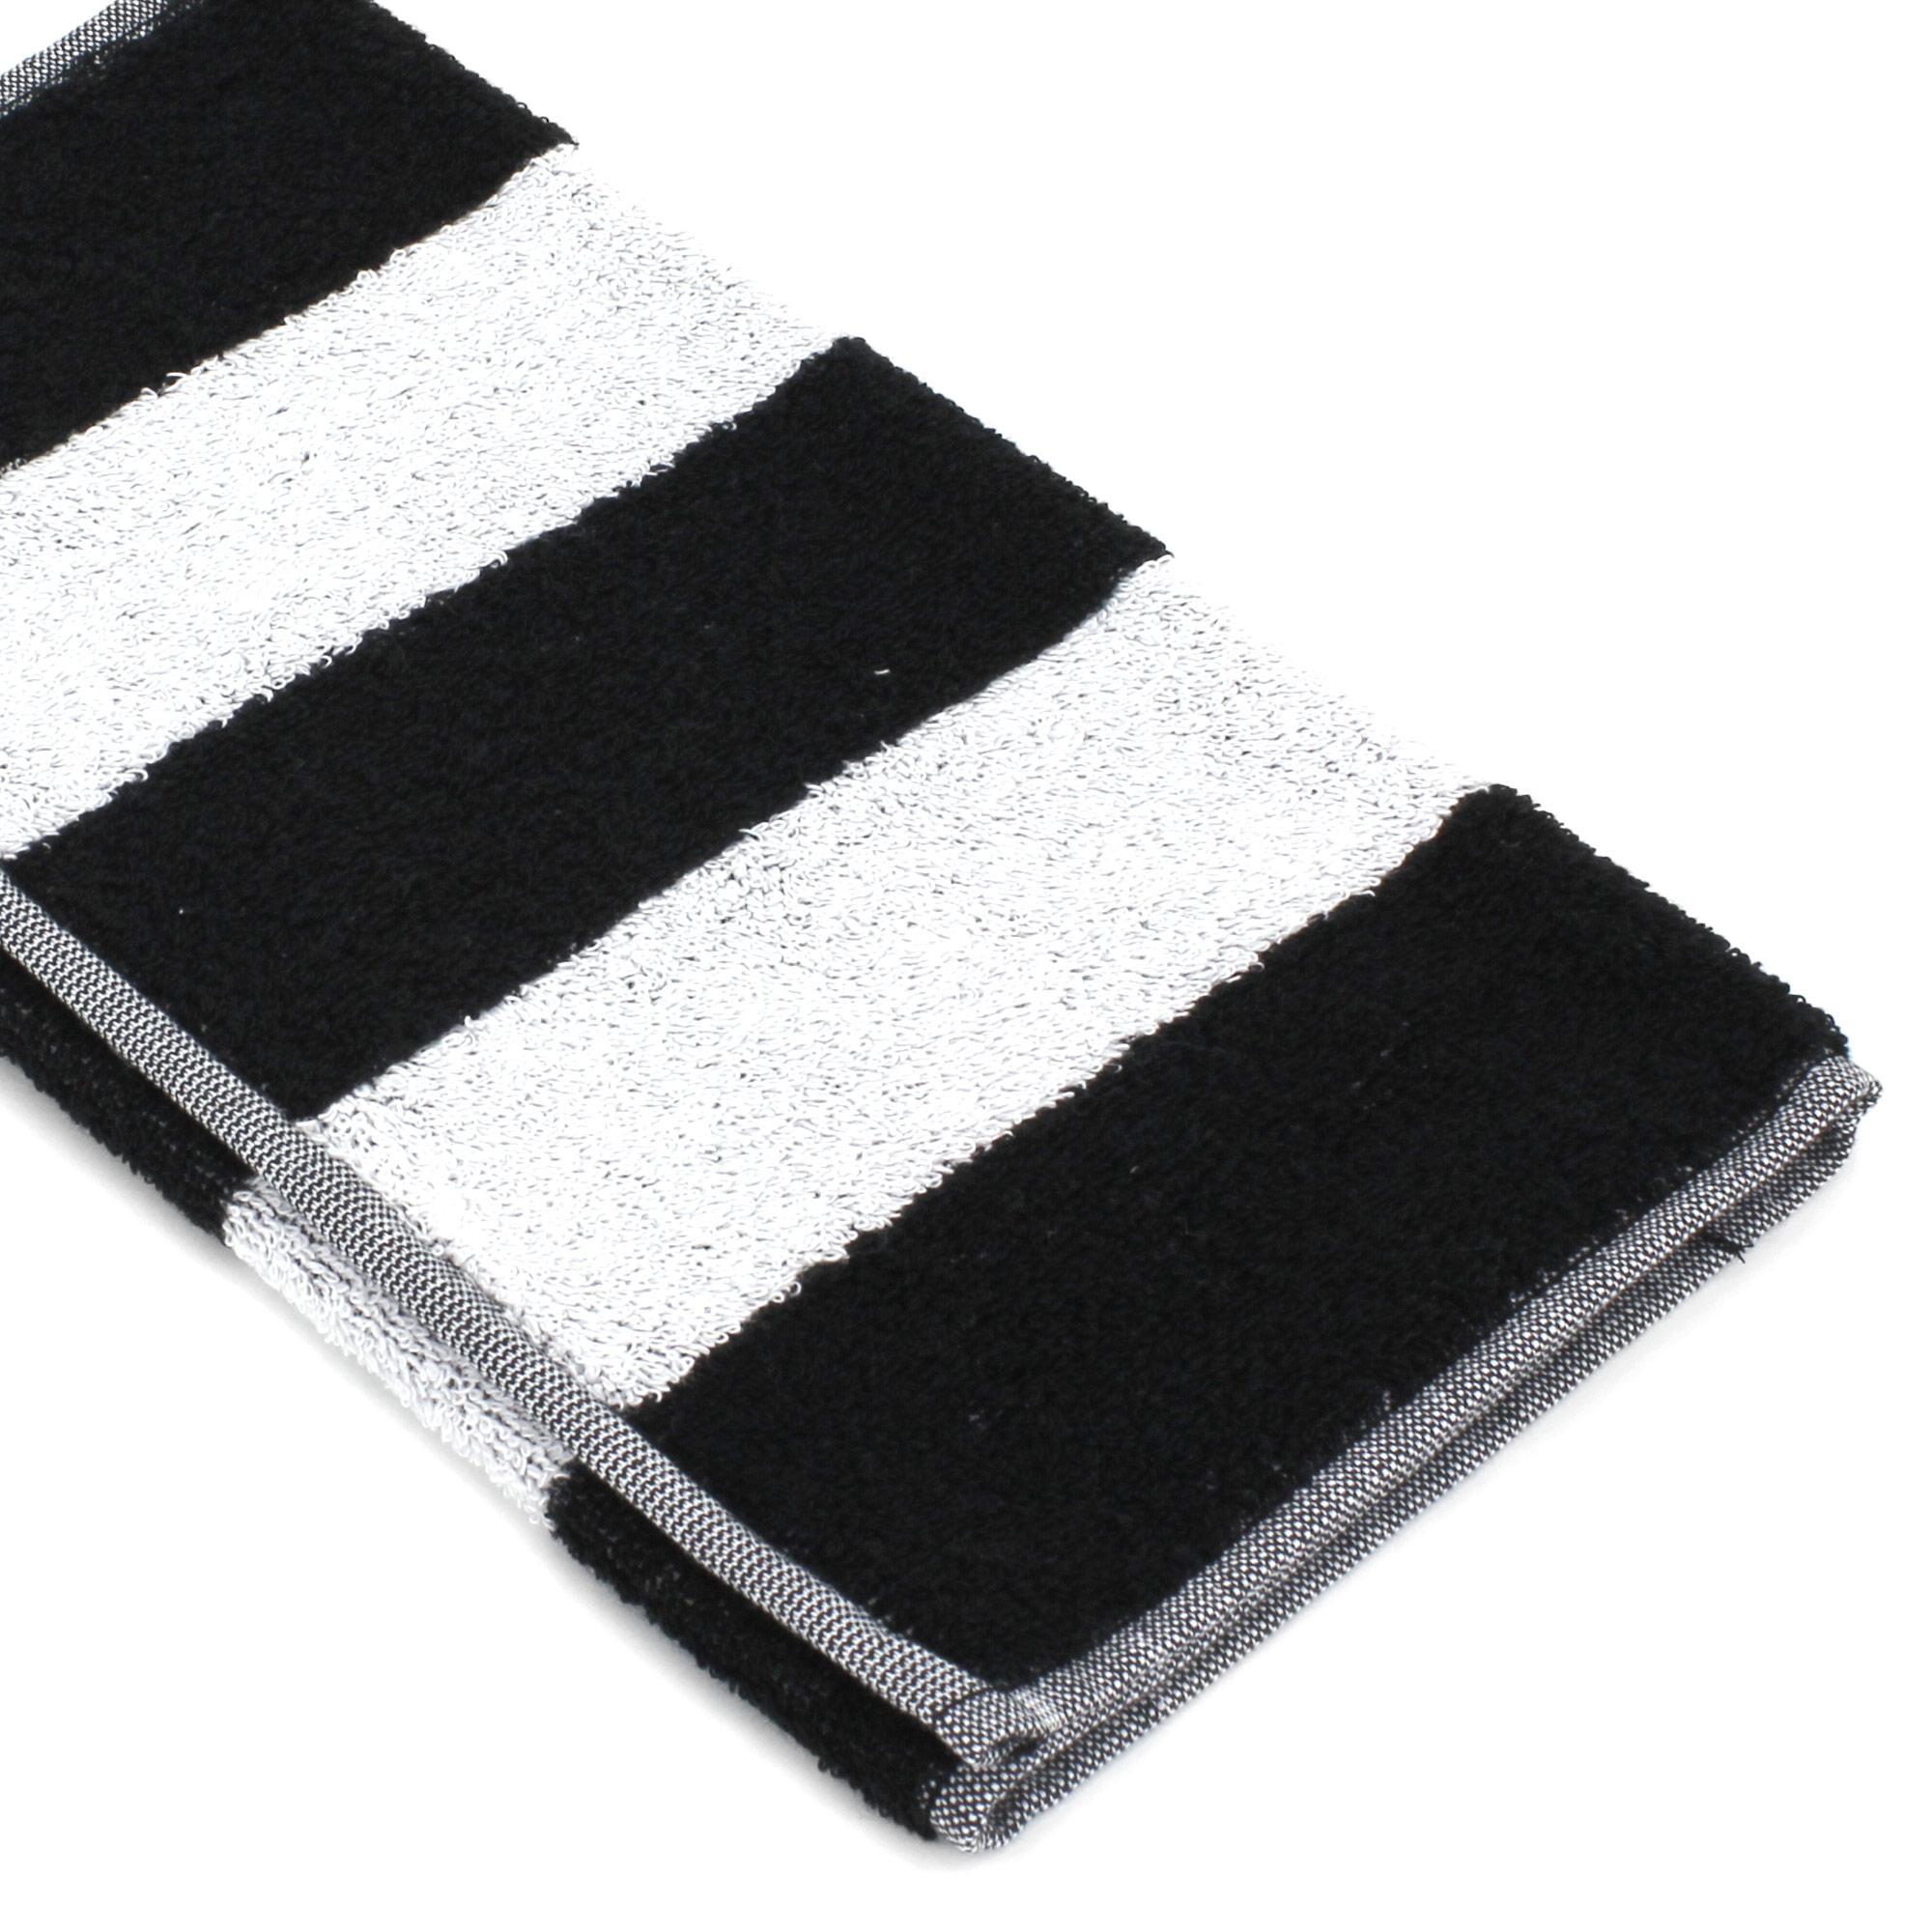 Serviette-invite-33x50-MONA-rayure-blanc-amp-noir-100-coton-480g-m2